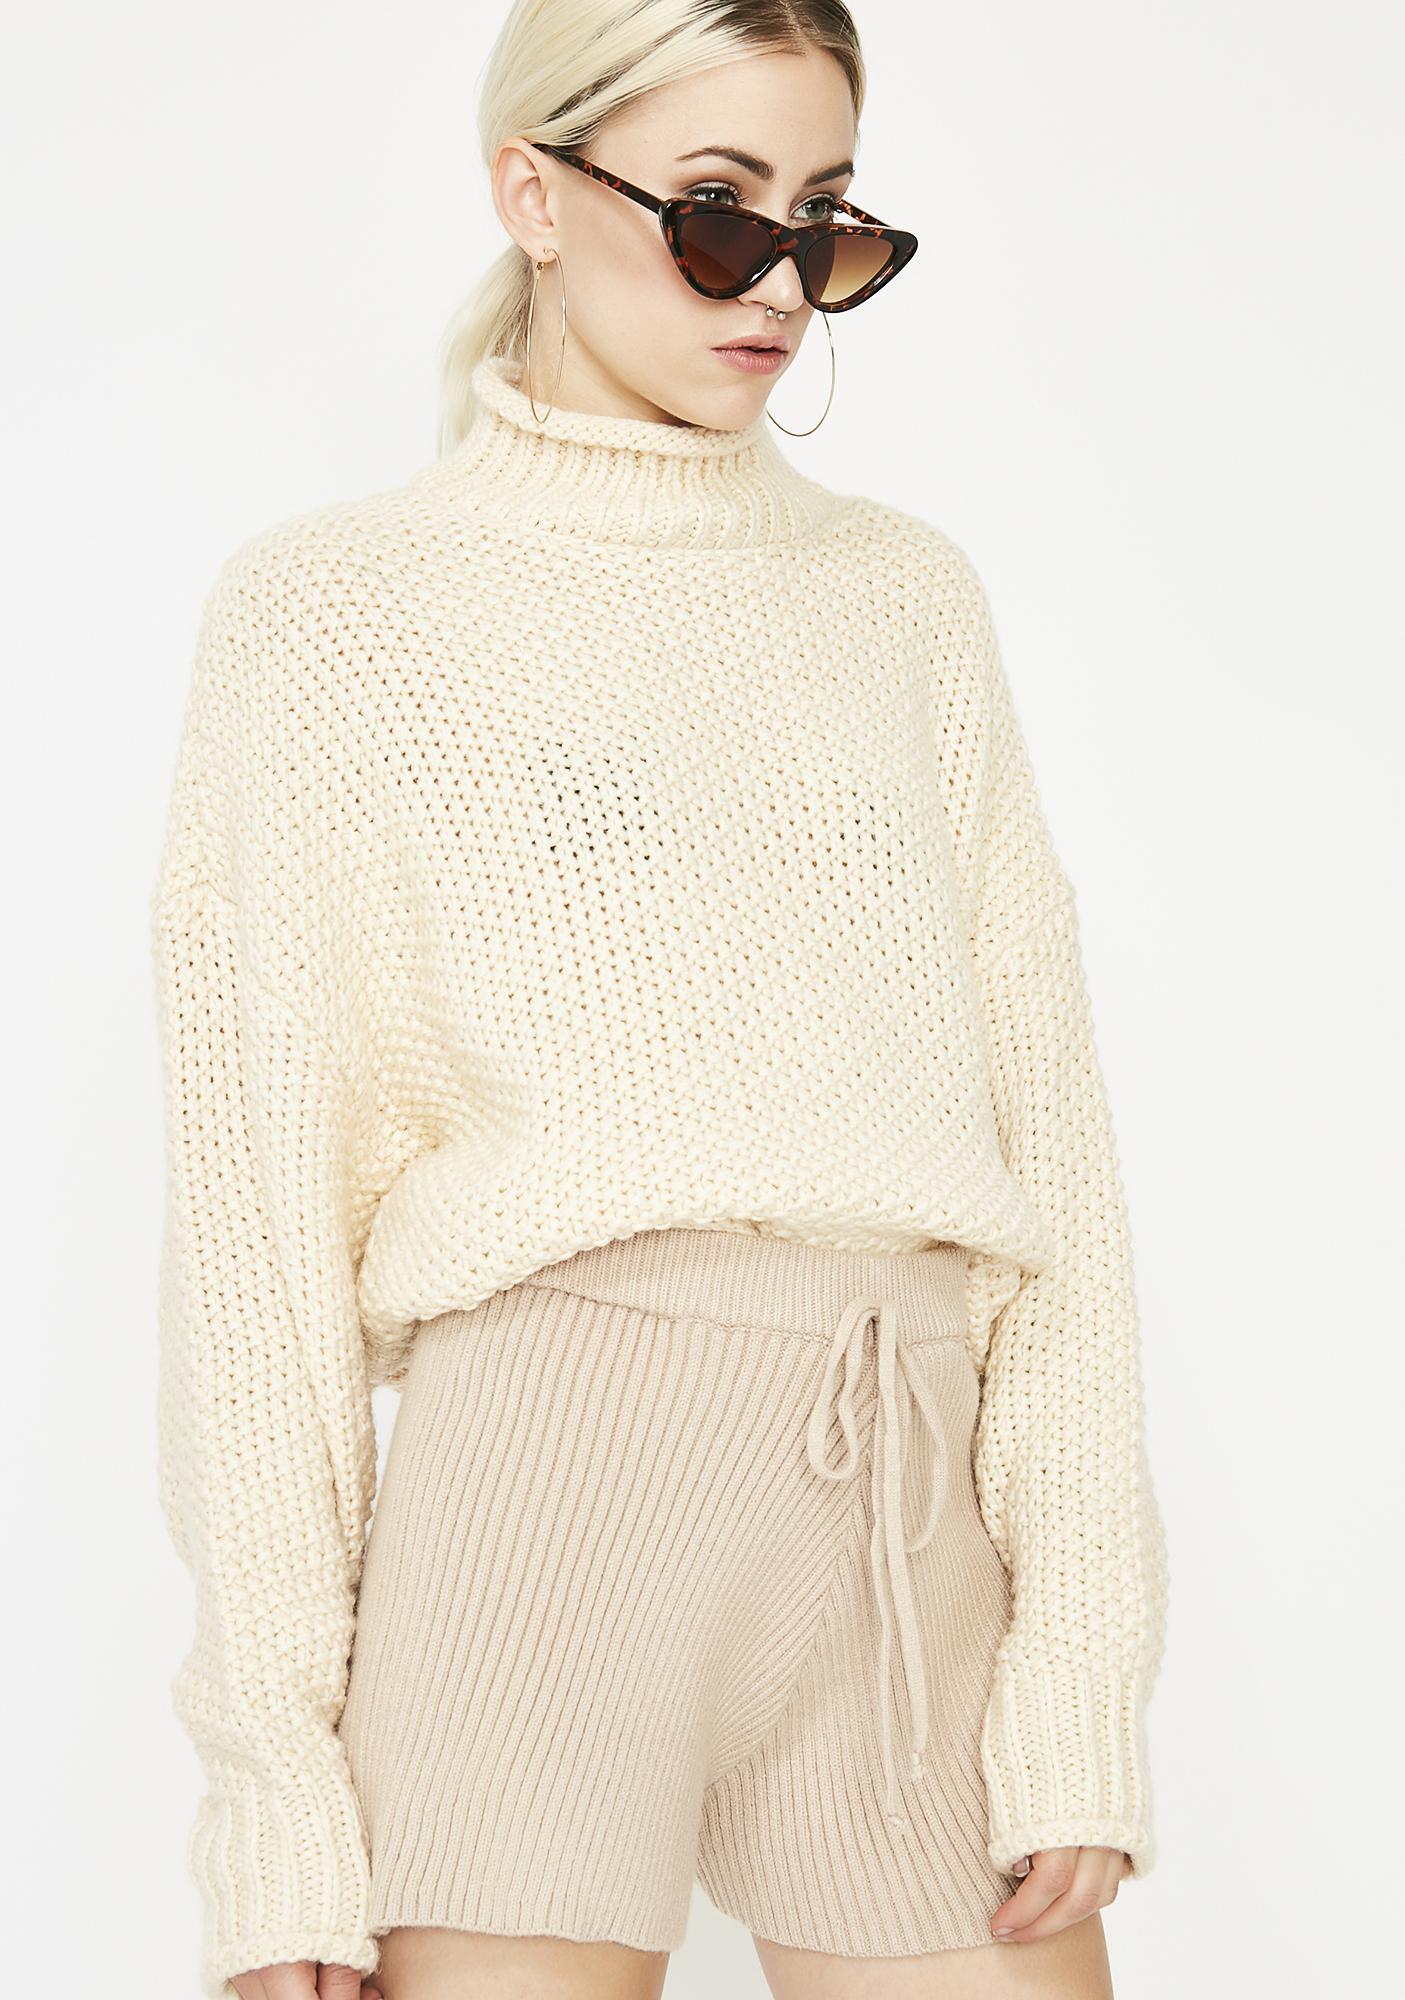 Latte Sweater Weather Knit Shorts